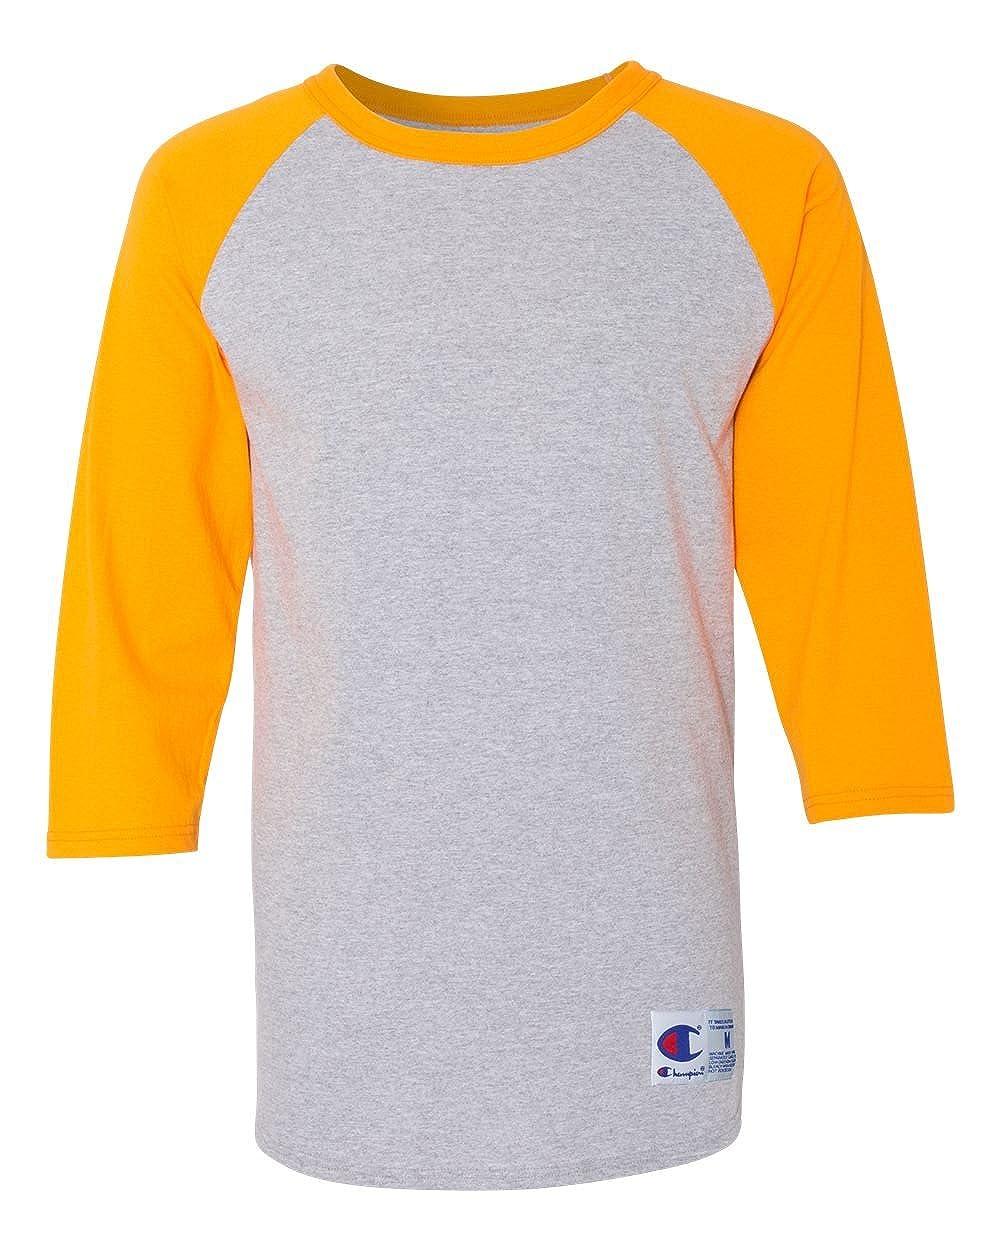 3f235863 Champion Men's Raglan Baseball T-Shirt at Amazon Men's Clothing store: